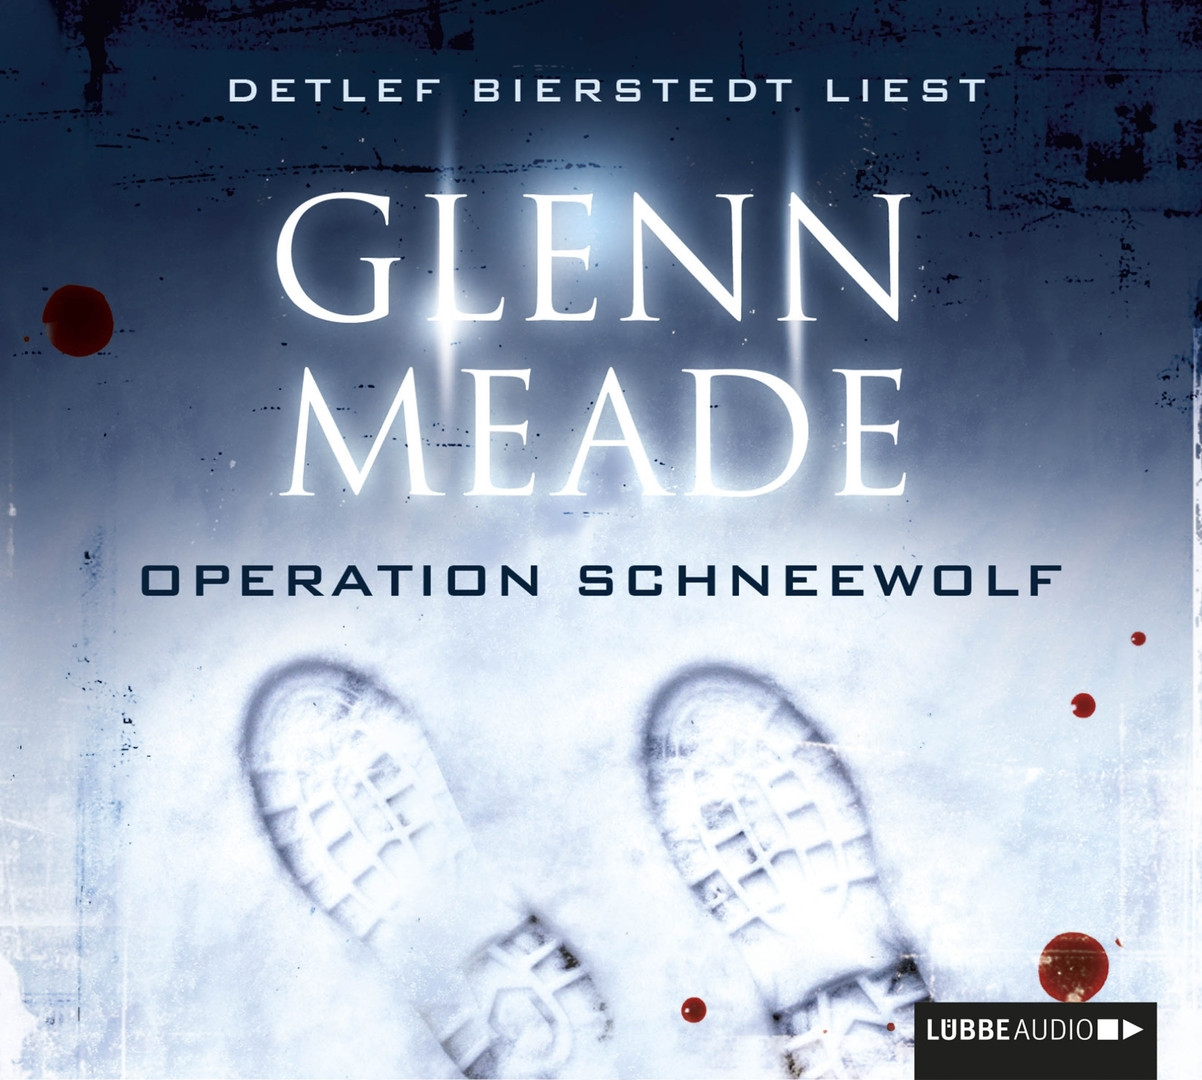 Glenn Meade - Operation Schneewolf